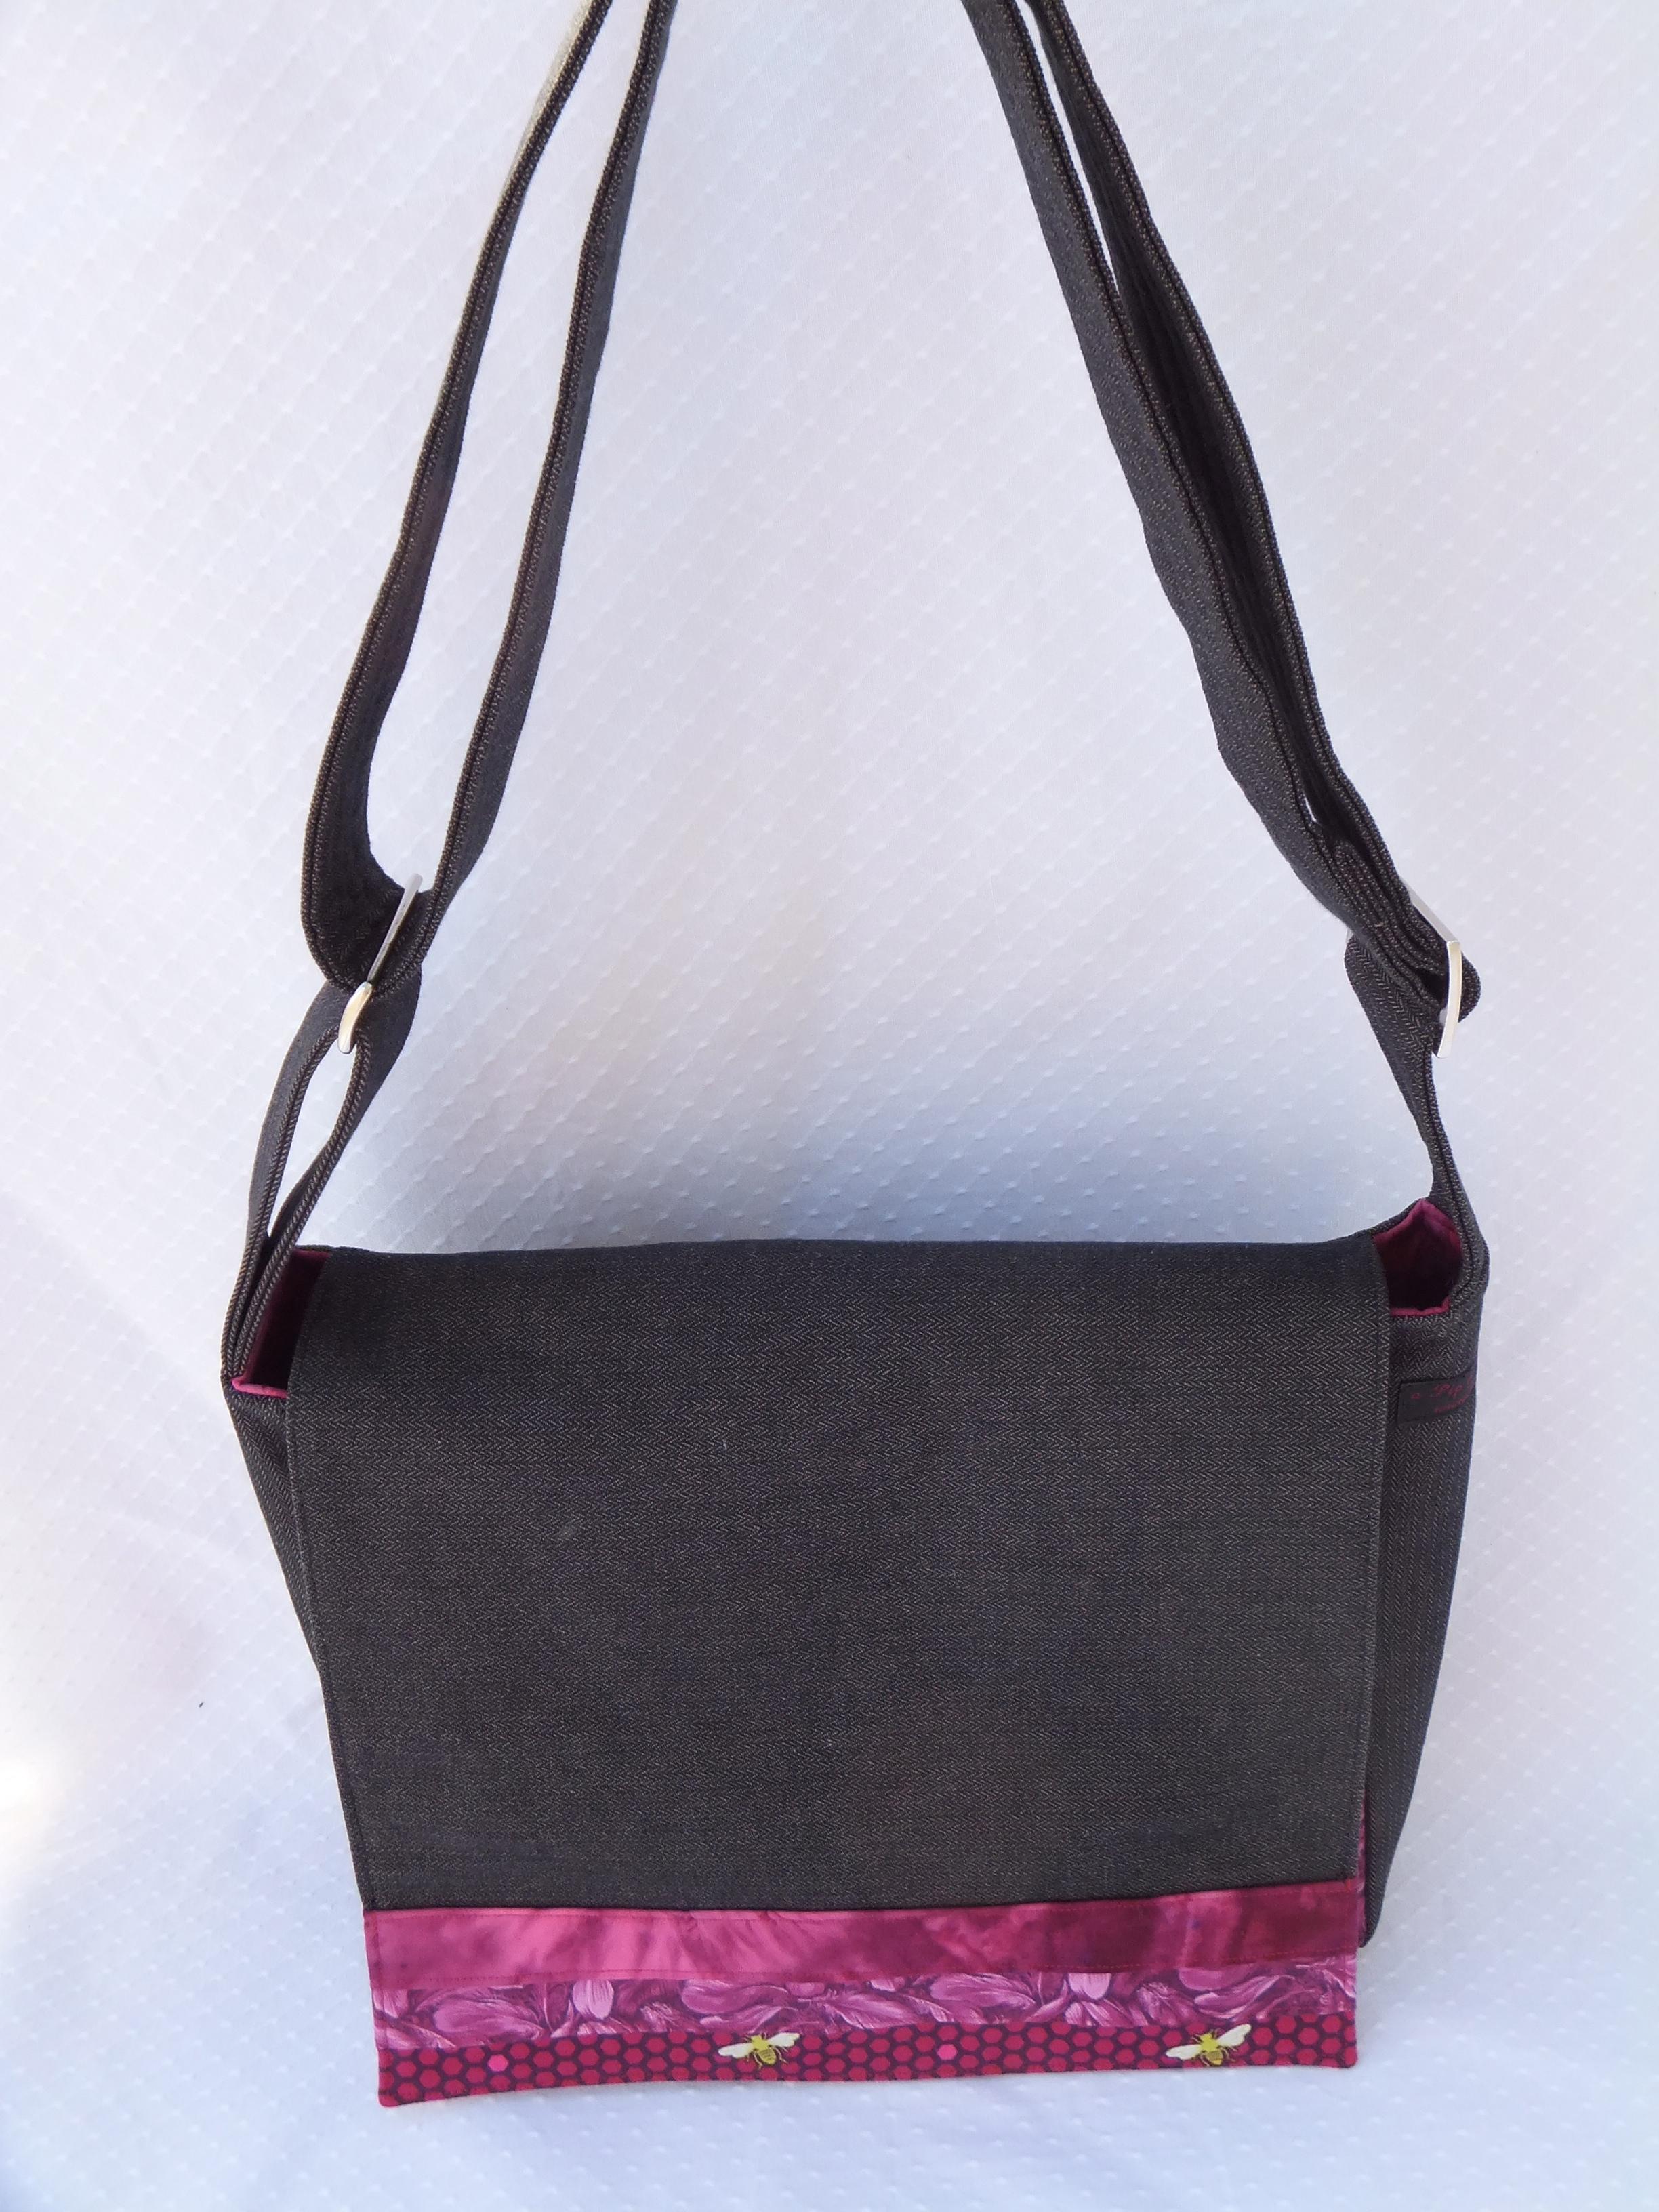 Front view of custom messenger bag